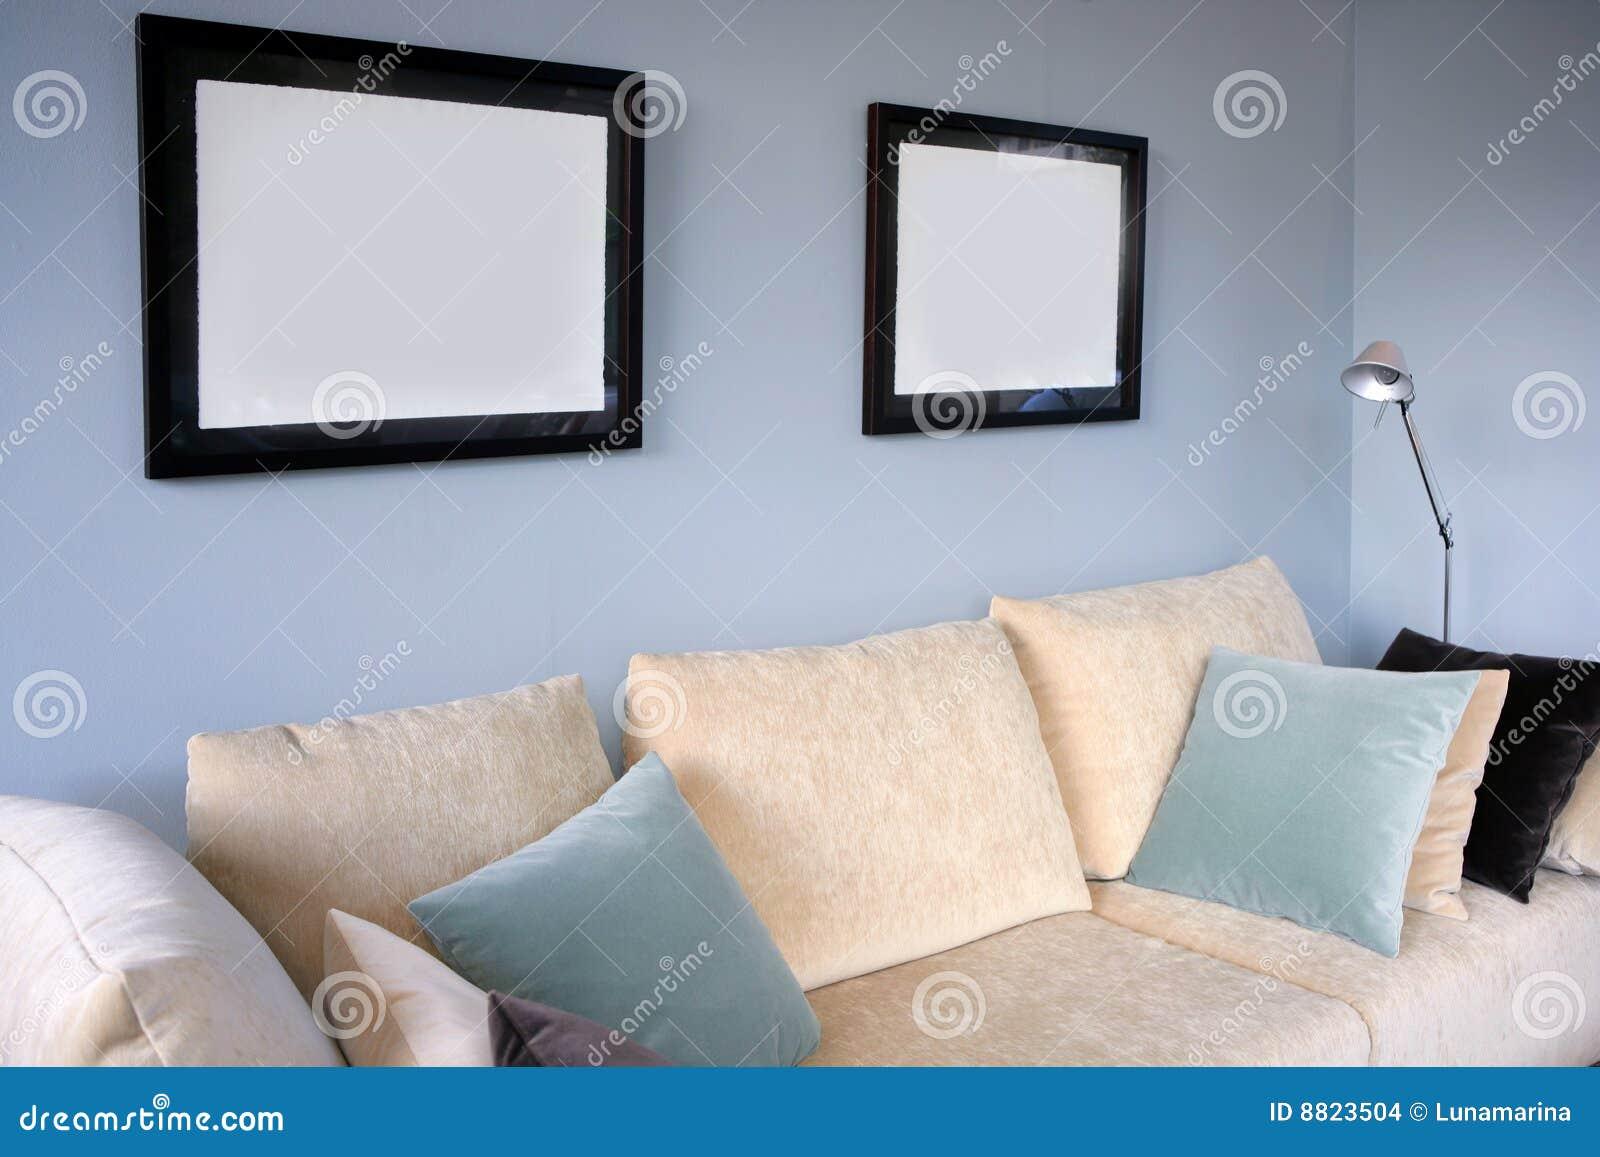 Woonkamer turquoise grijs - Blauwe turquoise decoratie ...